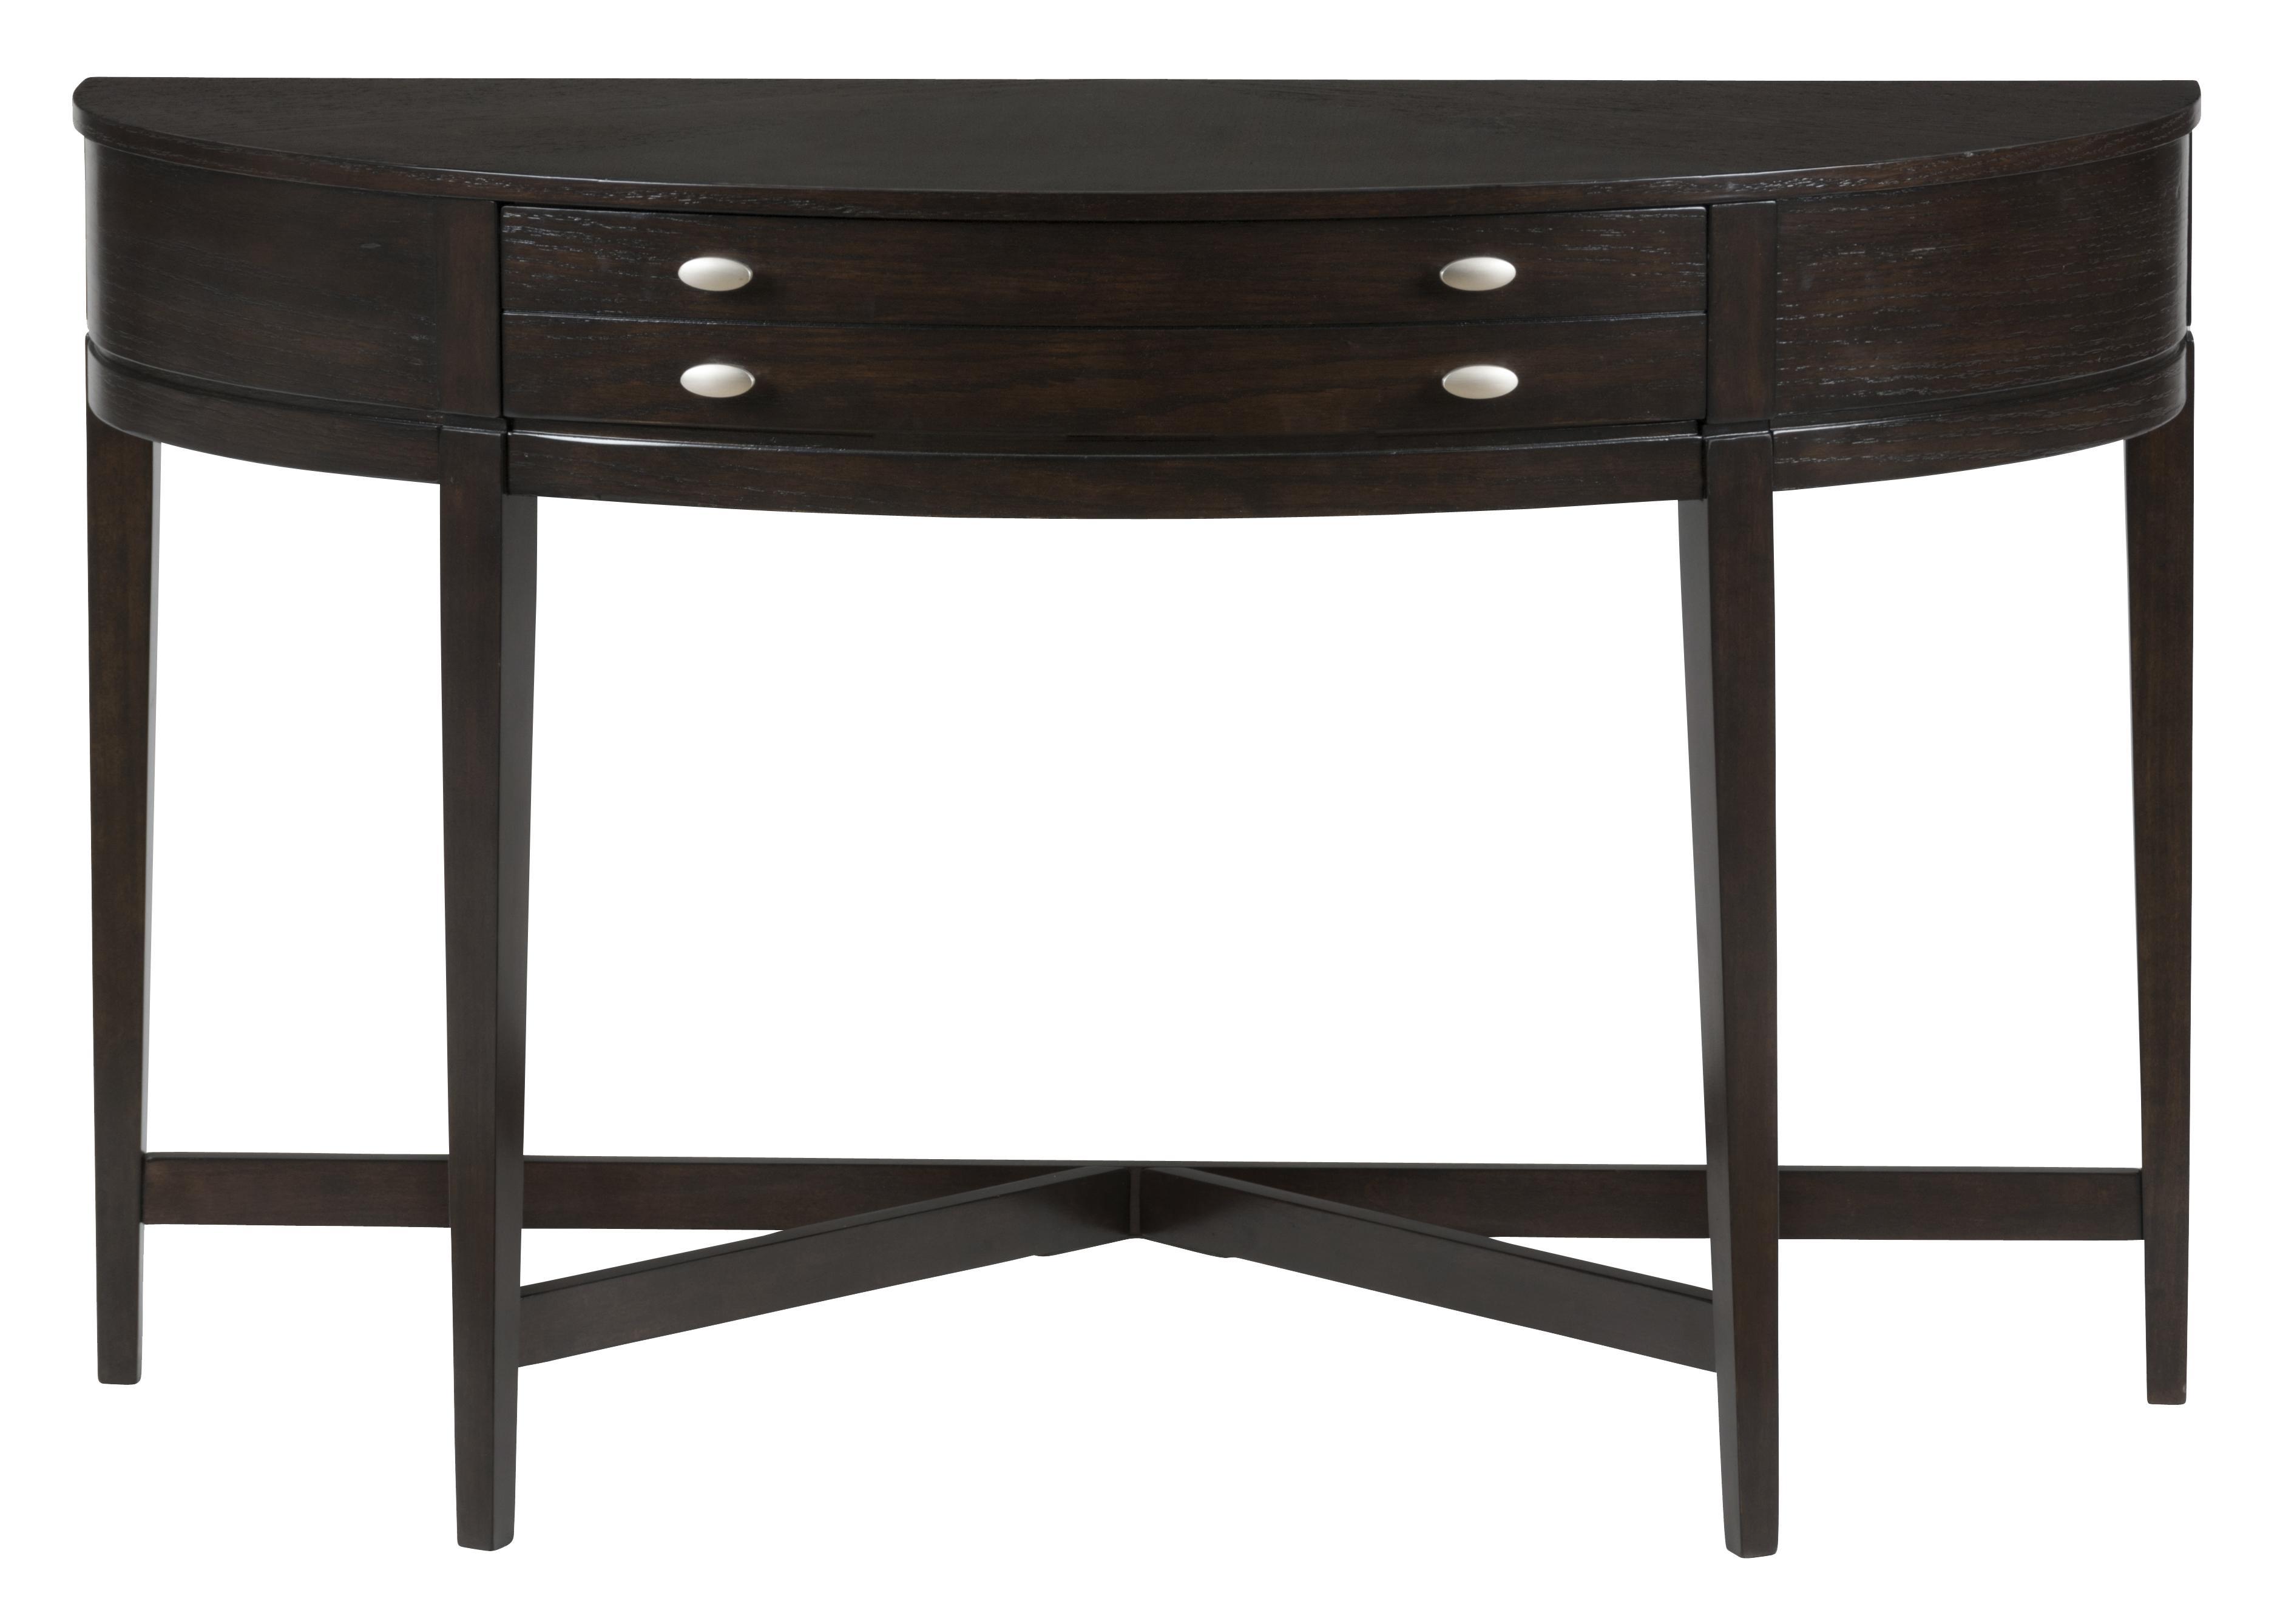 Jofran Miniatures - Kent County Demi-Lune Sofa Table - Item Number: 844-4